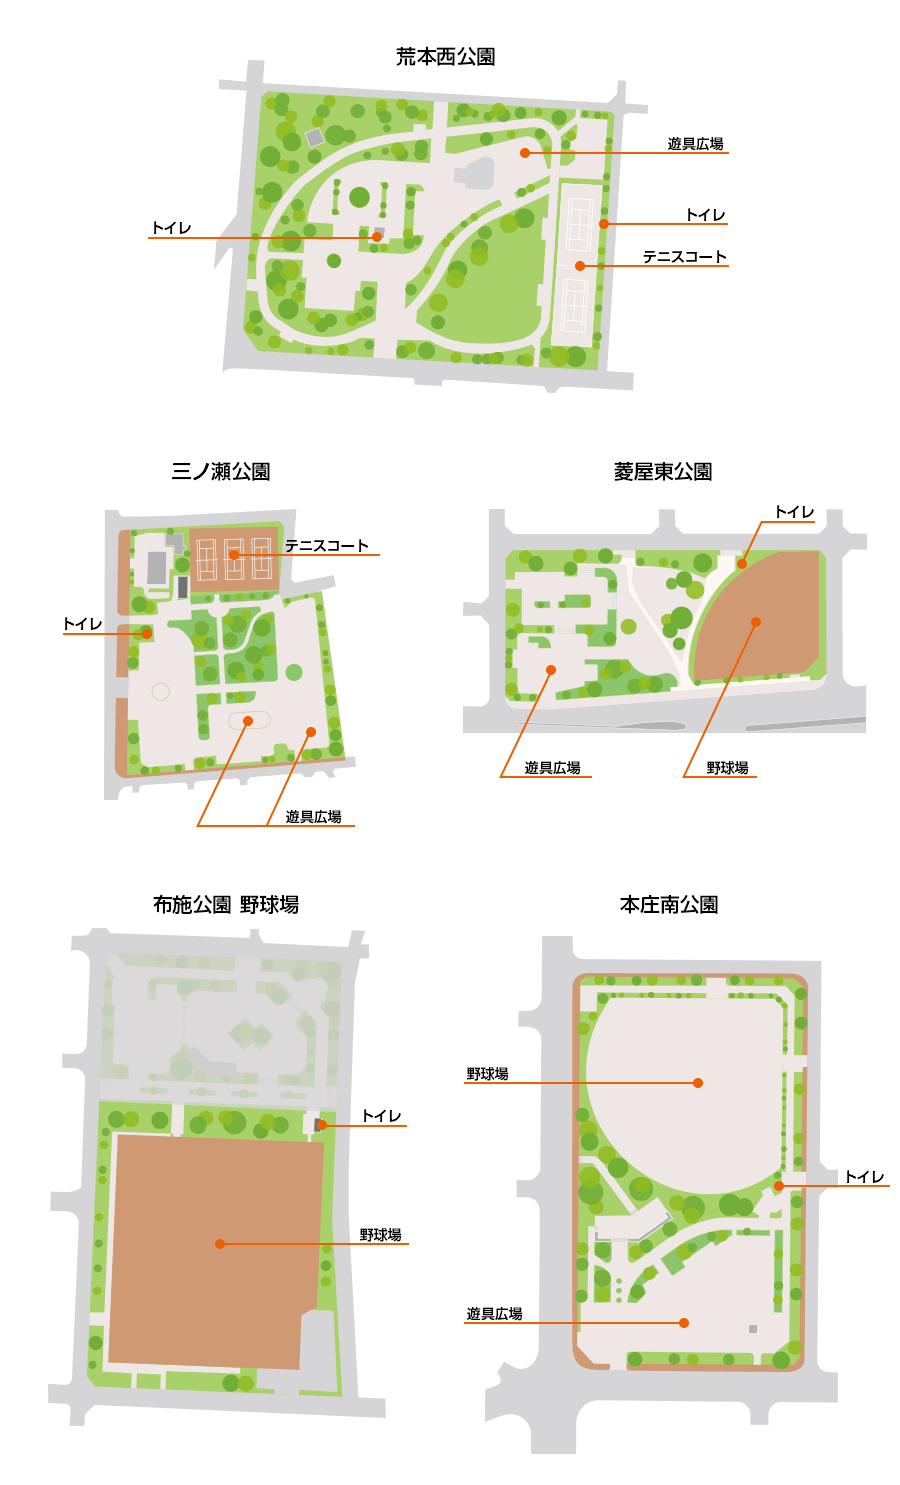 東大阪市の公園:荒本西公園、三ノ瀬公園、菱屋東公園、布施公園、本庄南公園ガイドマップ